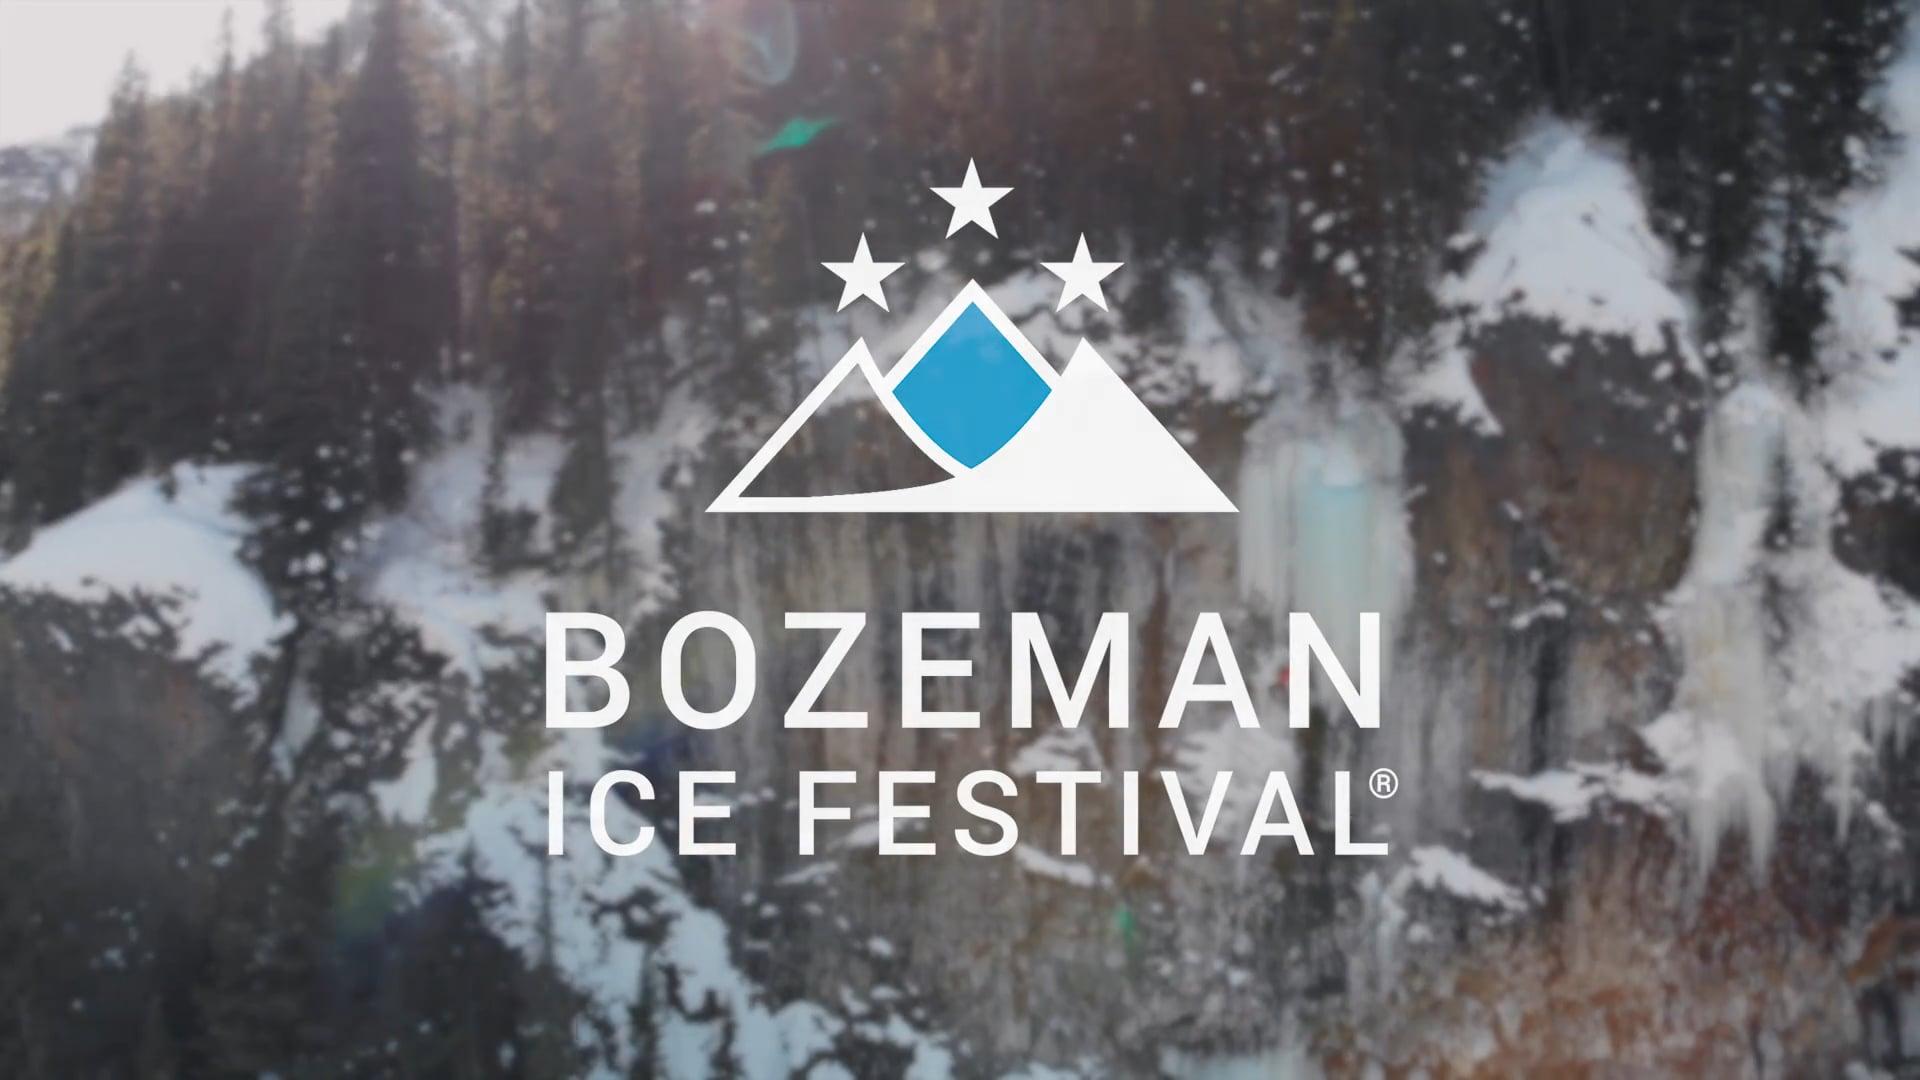 Bozeman Ice Fest Promo